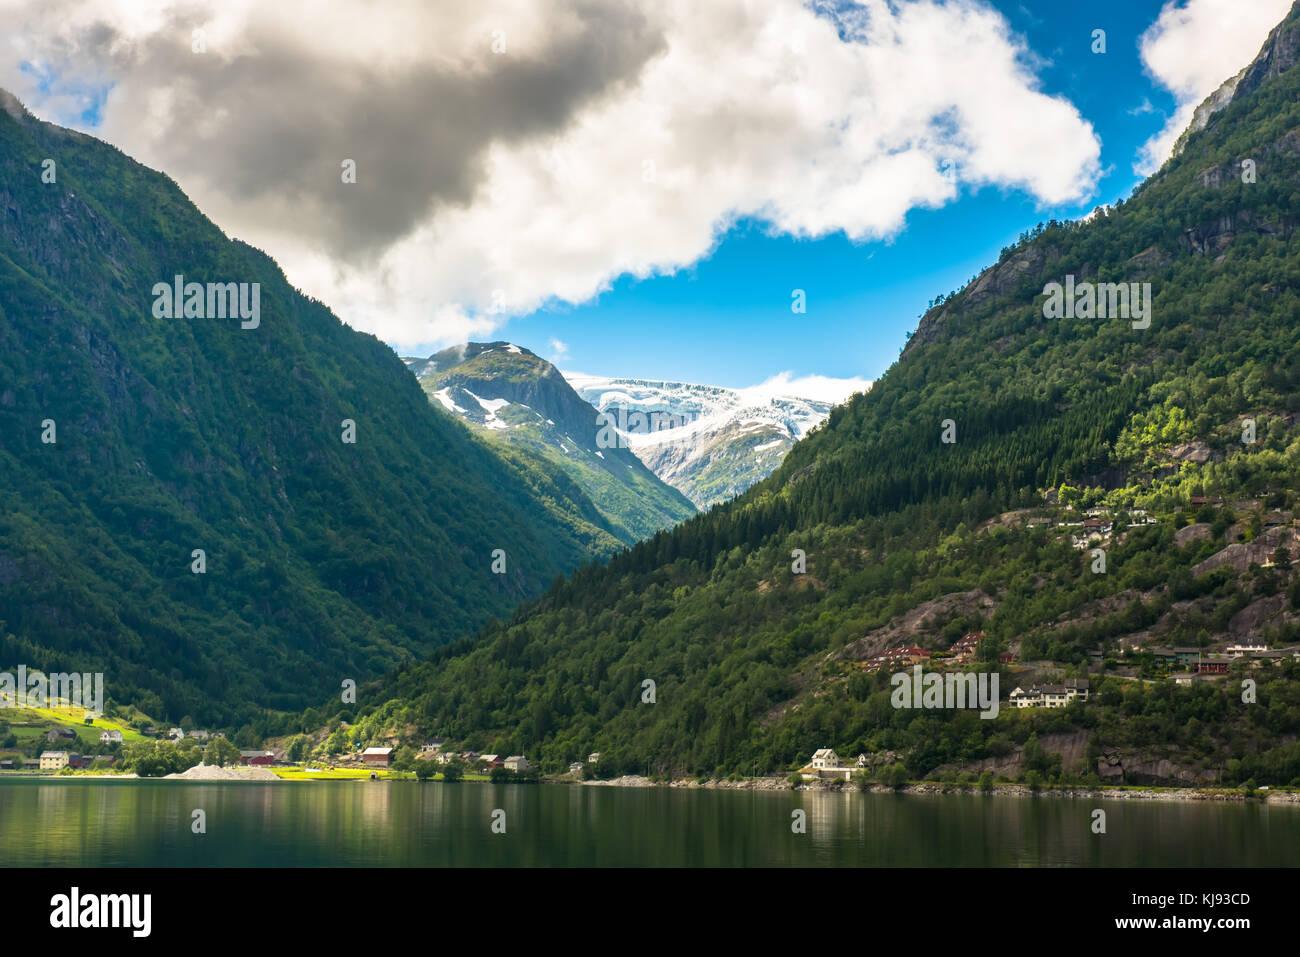 Fjord Hardanger Norvège paysage. Photo Stock